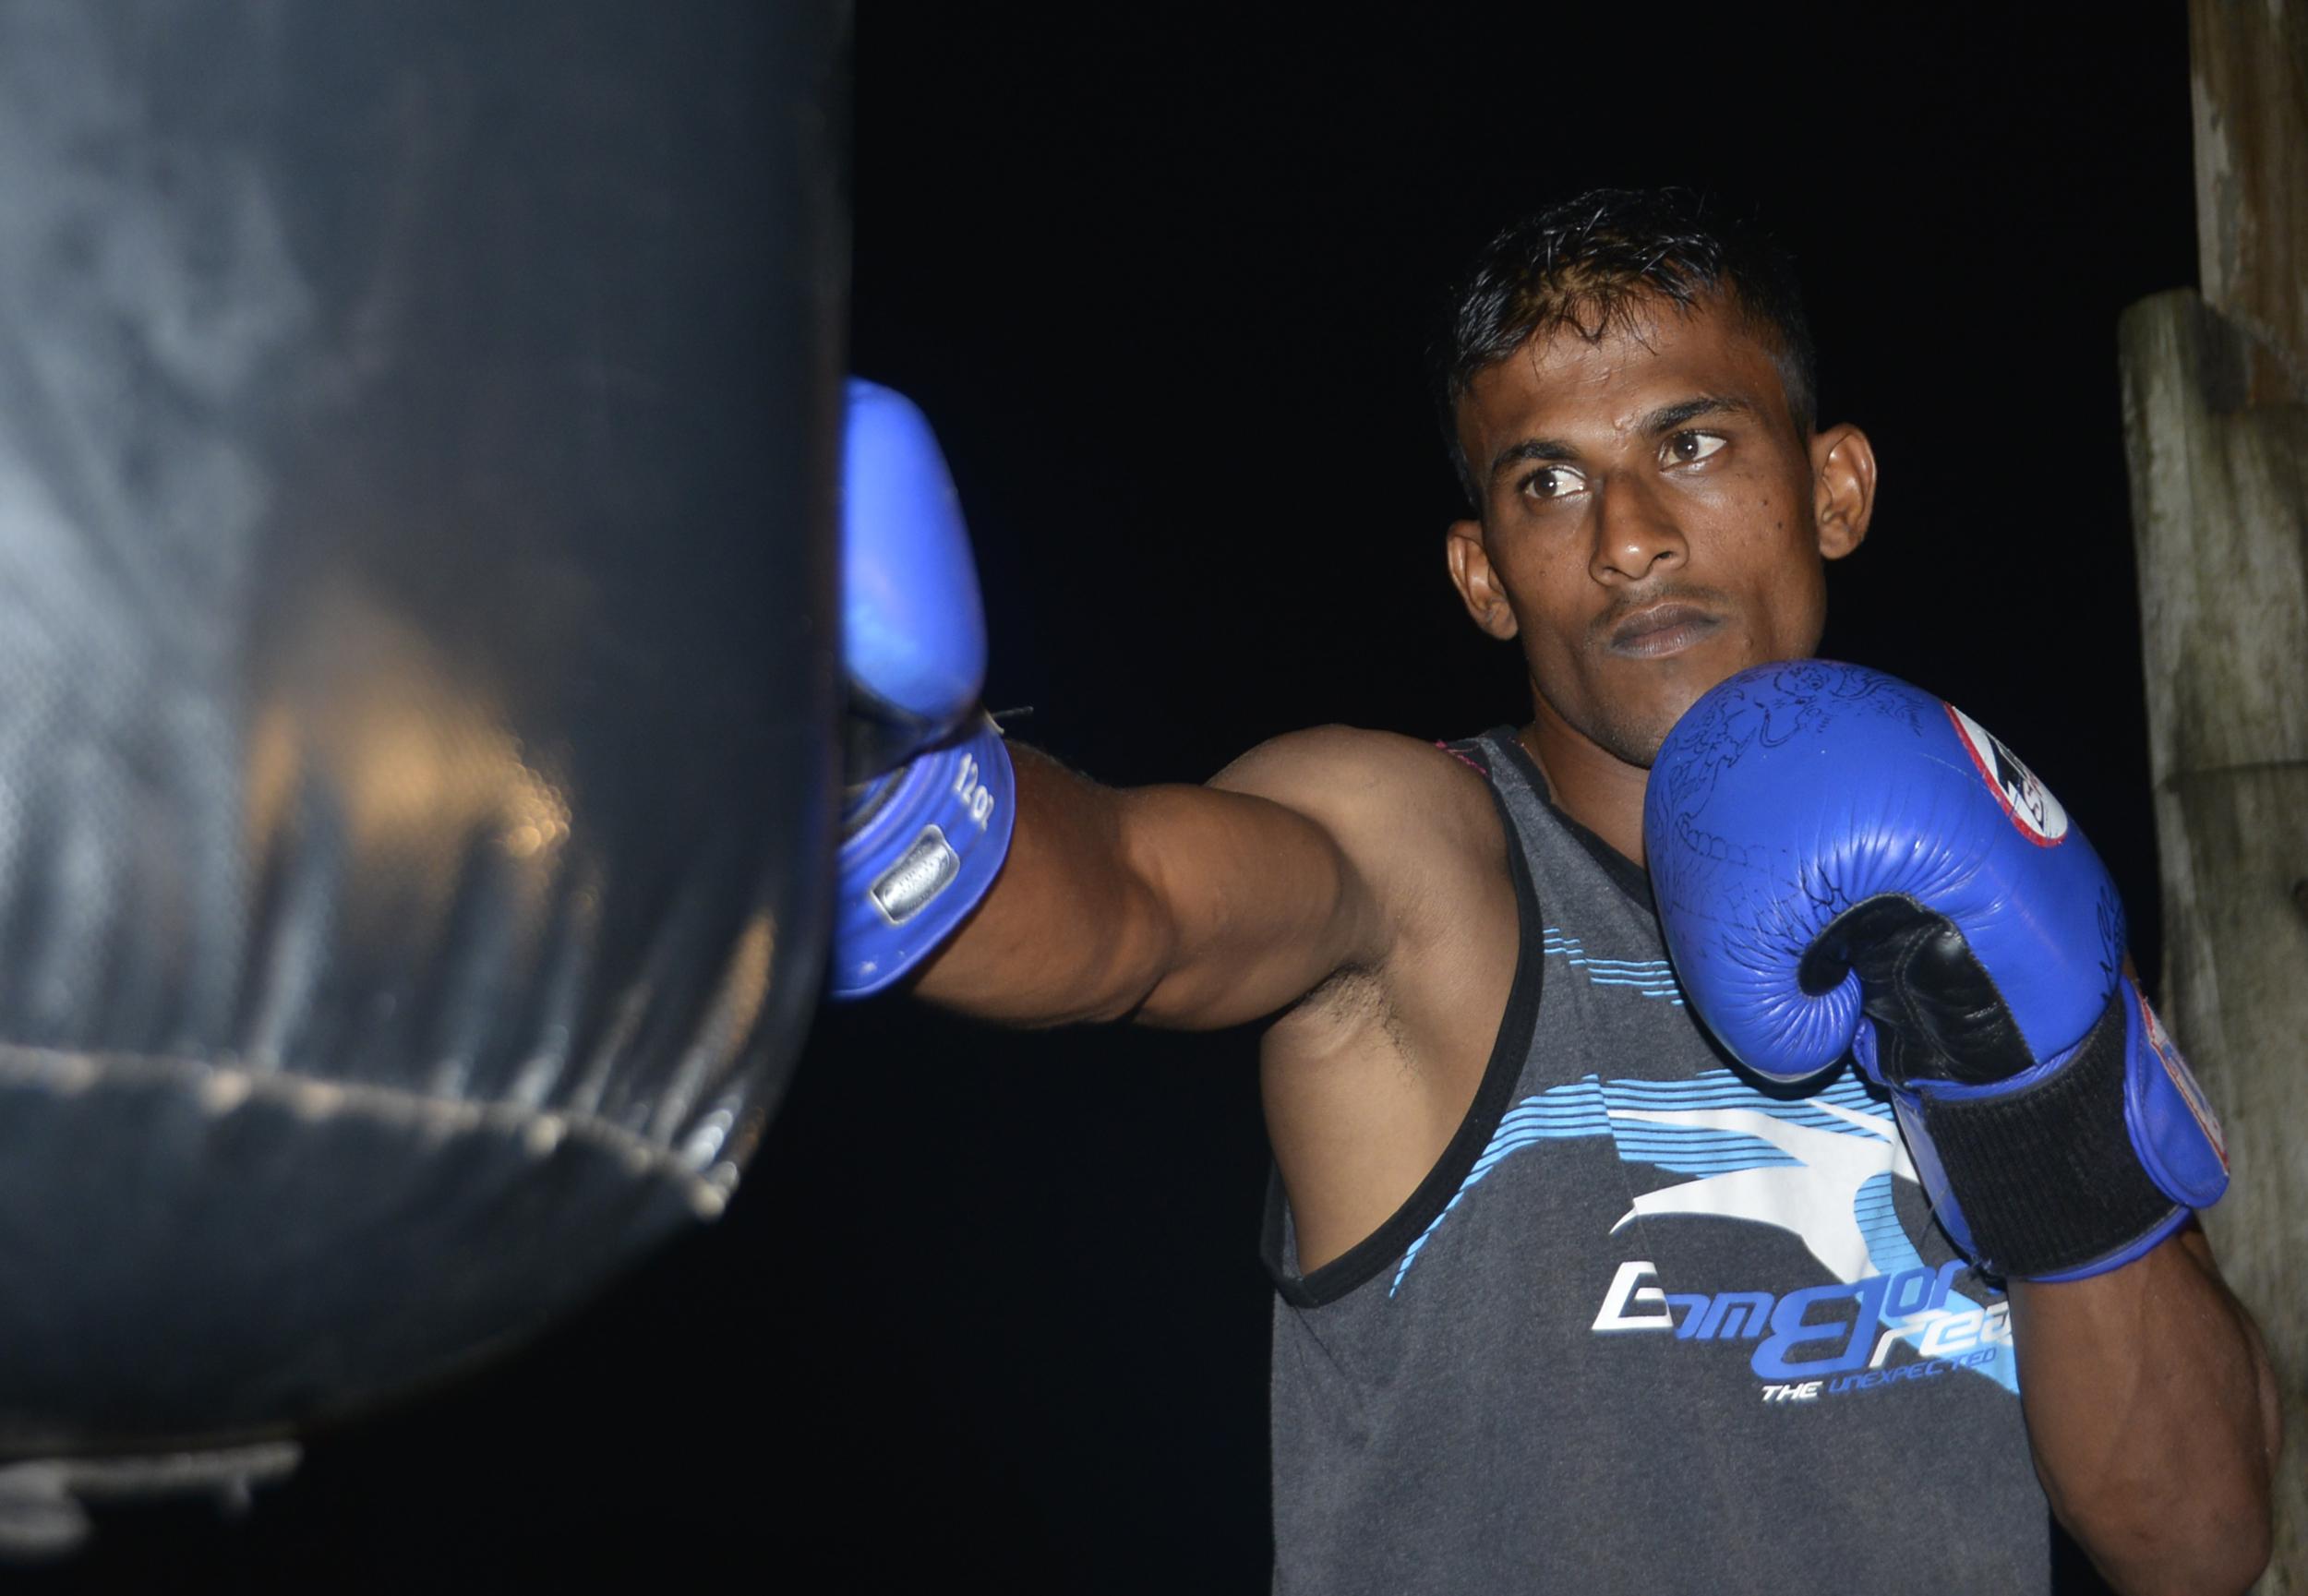 Shamal Ramanuj during training at Mulomulo boxing club in Nadi last night. Photo: WAISEA NASOKIA